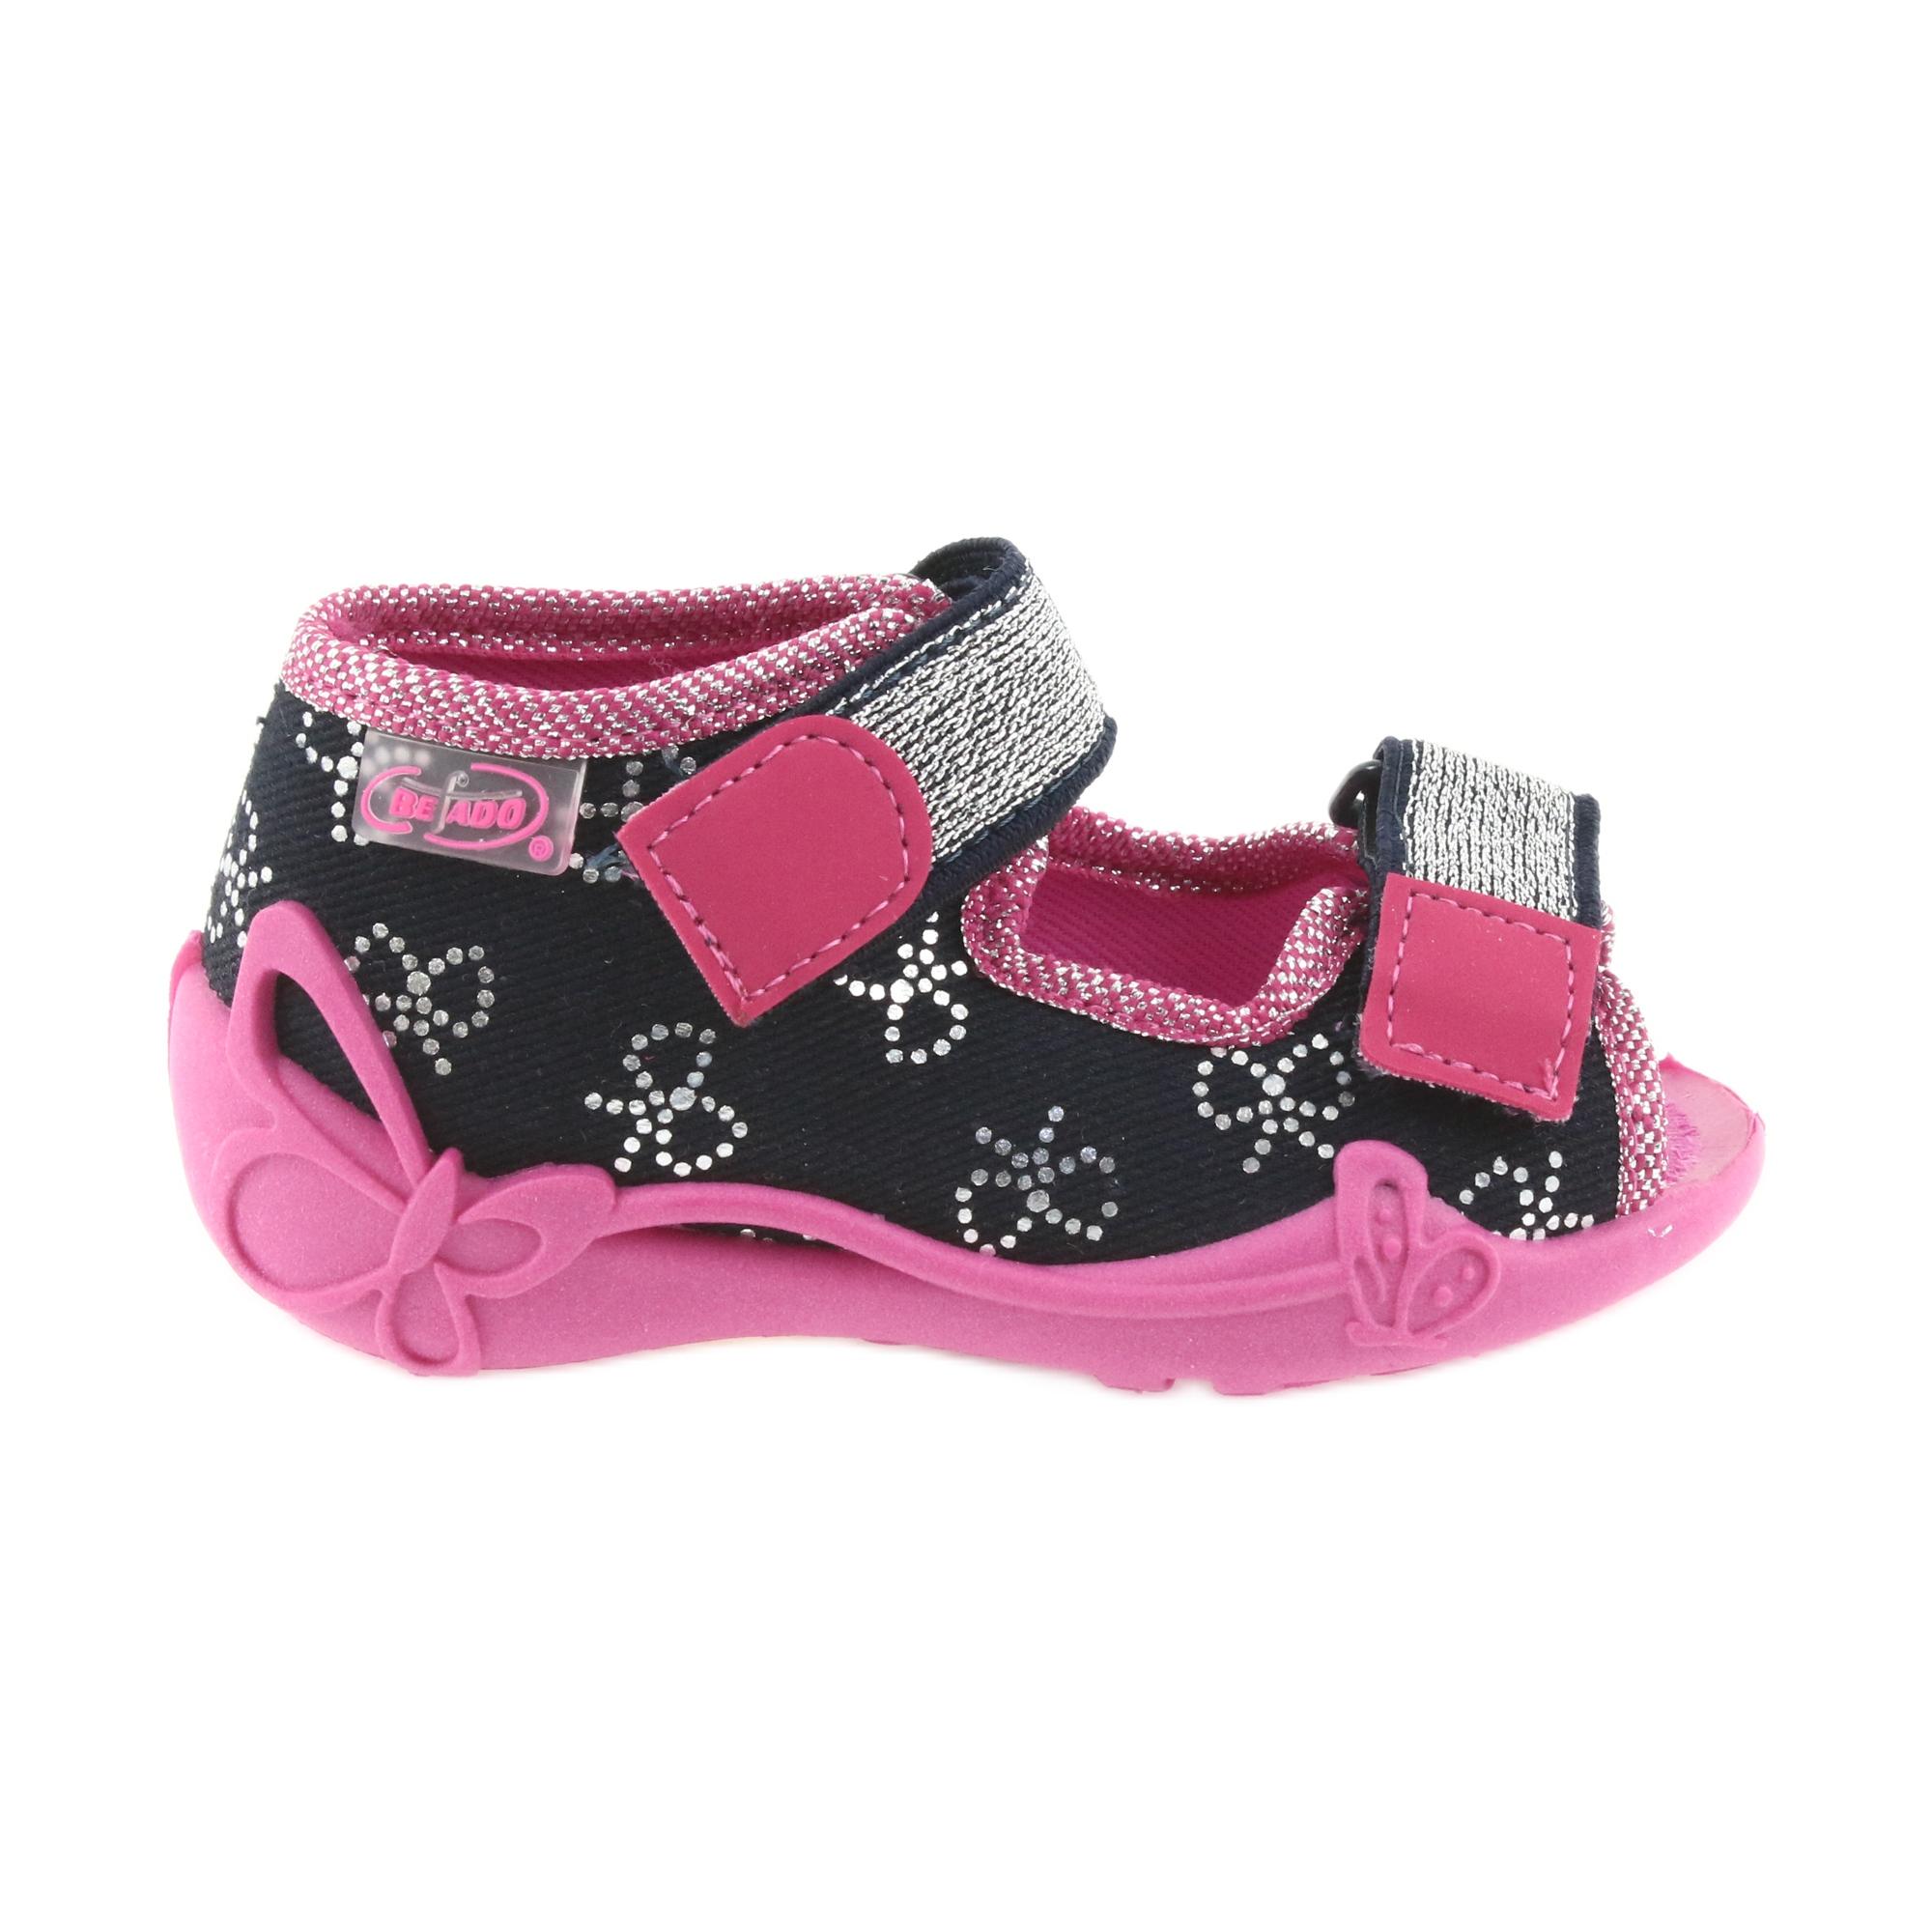 Befado children/'s shoes 242P104